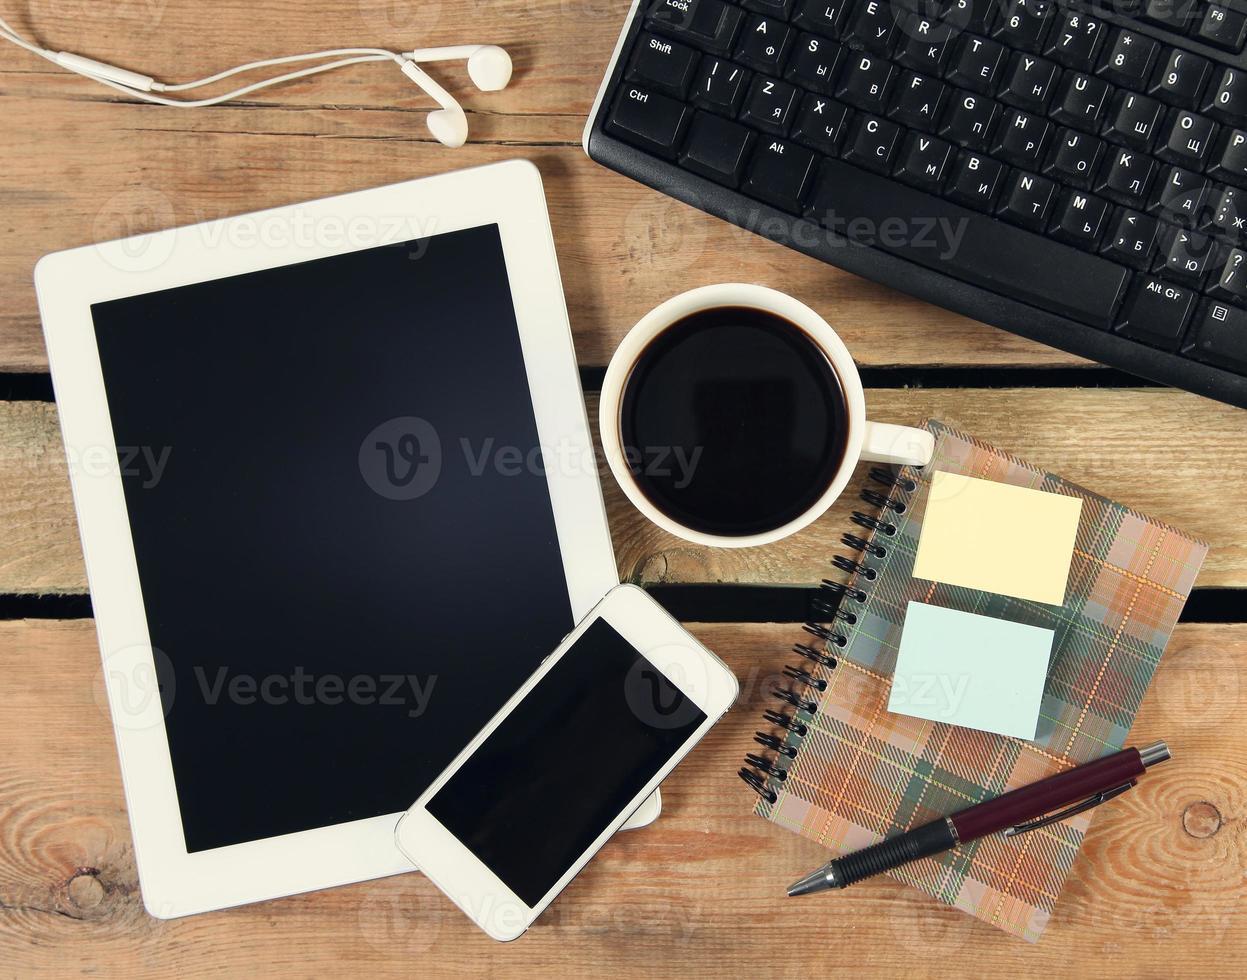 tangentbord foto